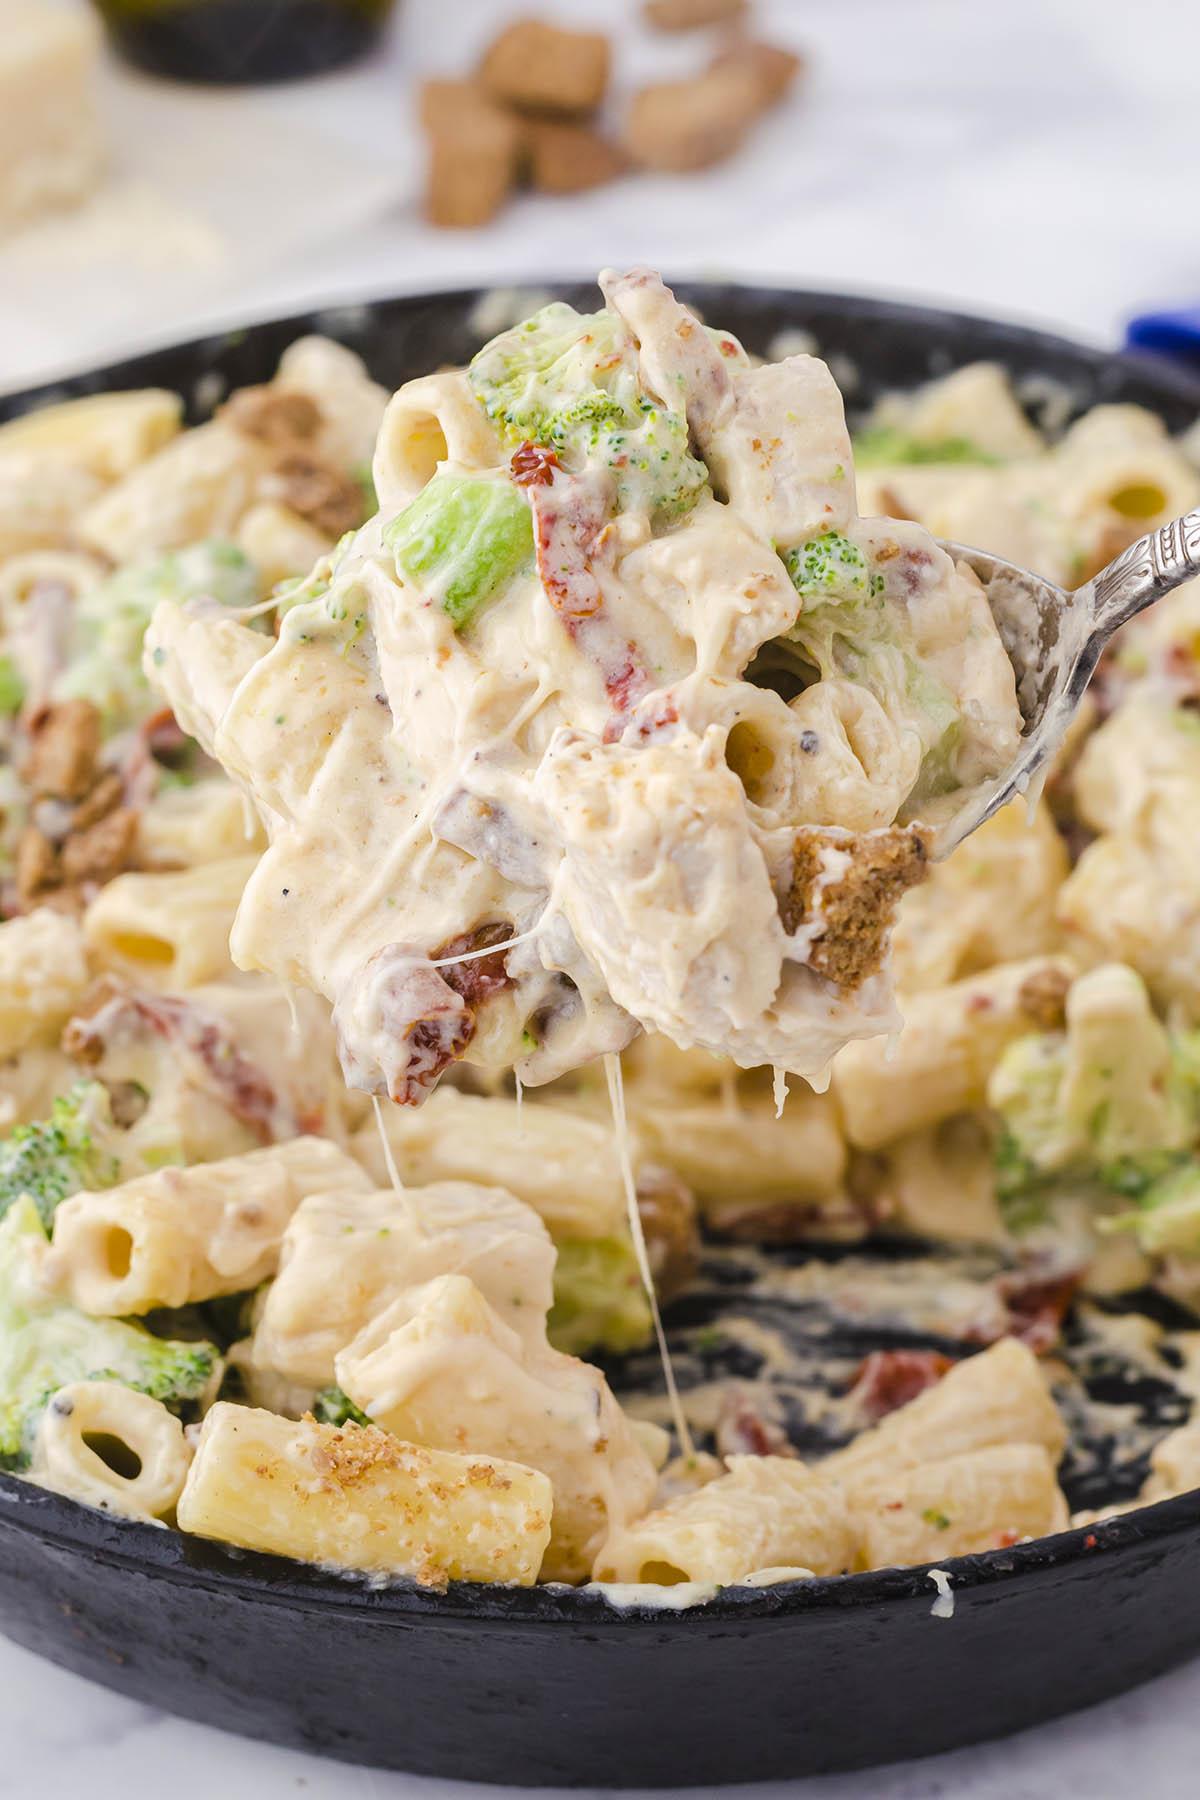 Alfredo Chicken and pasta in cast iron skillet.